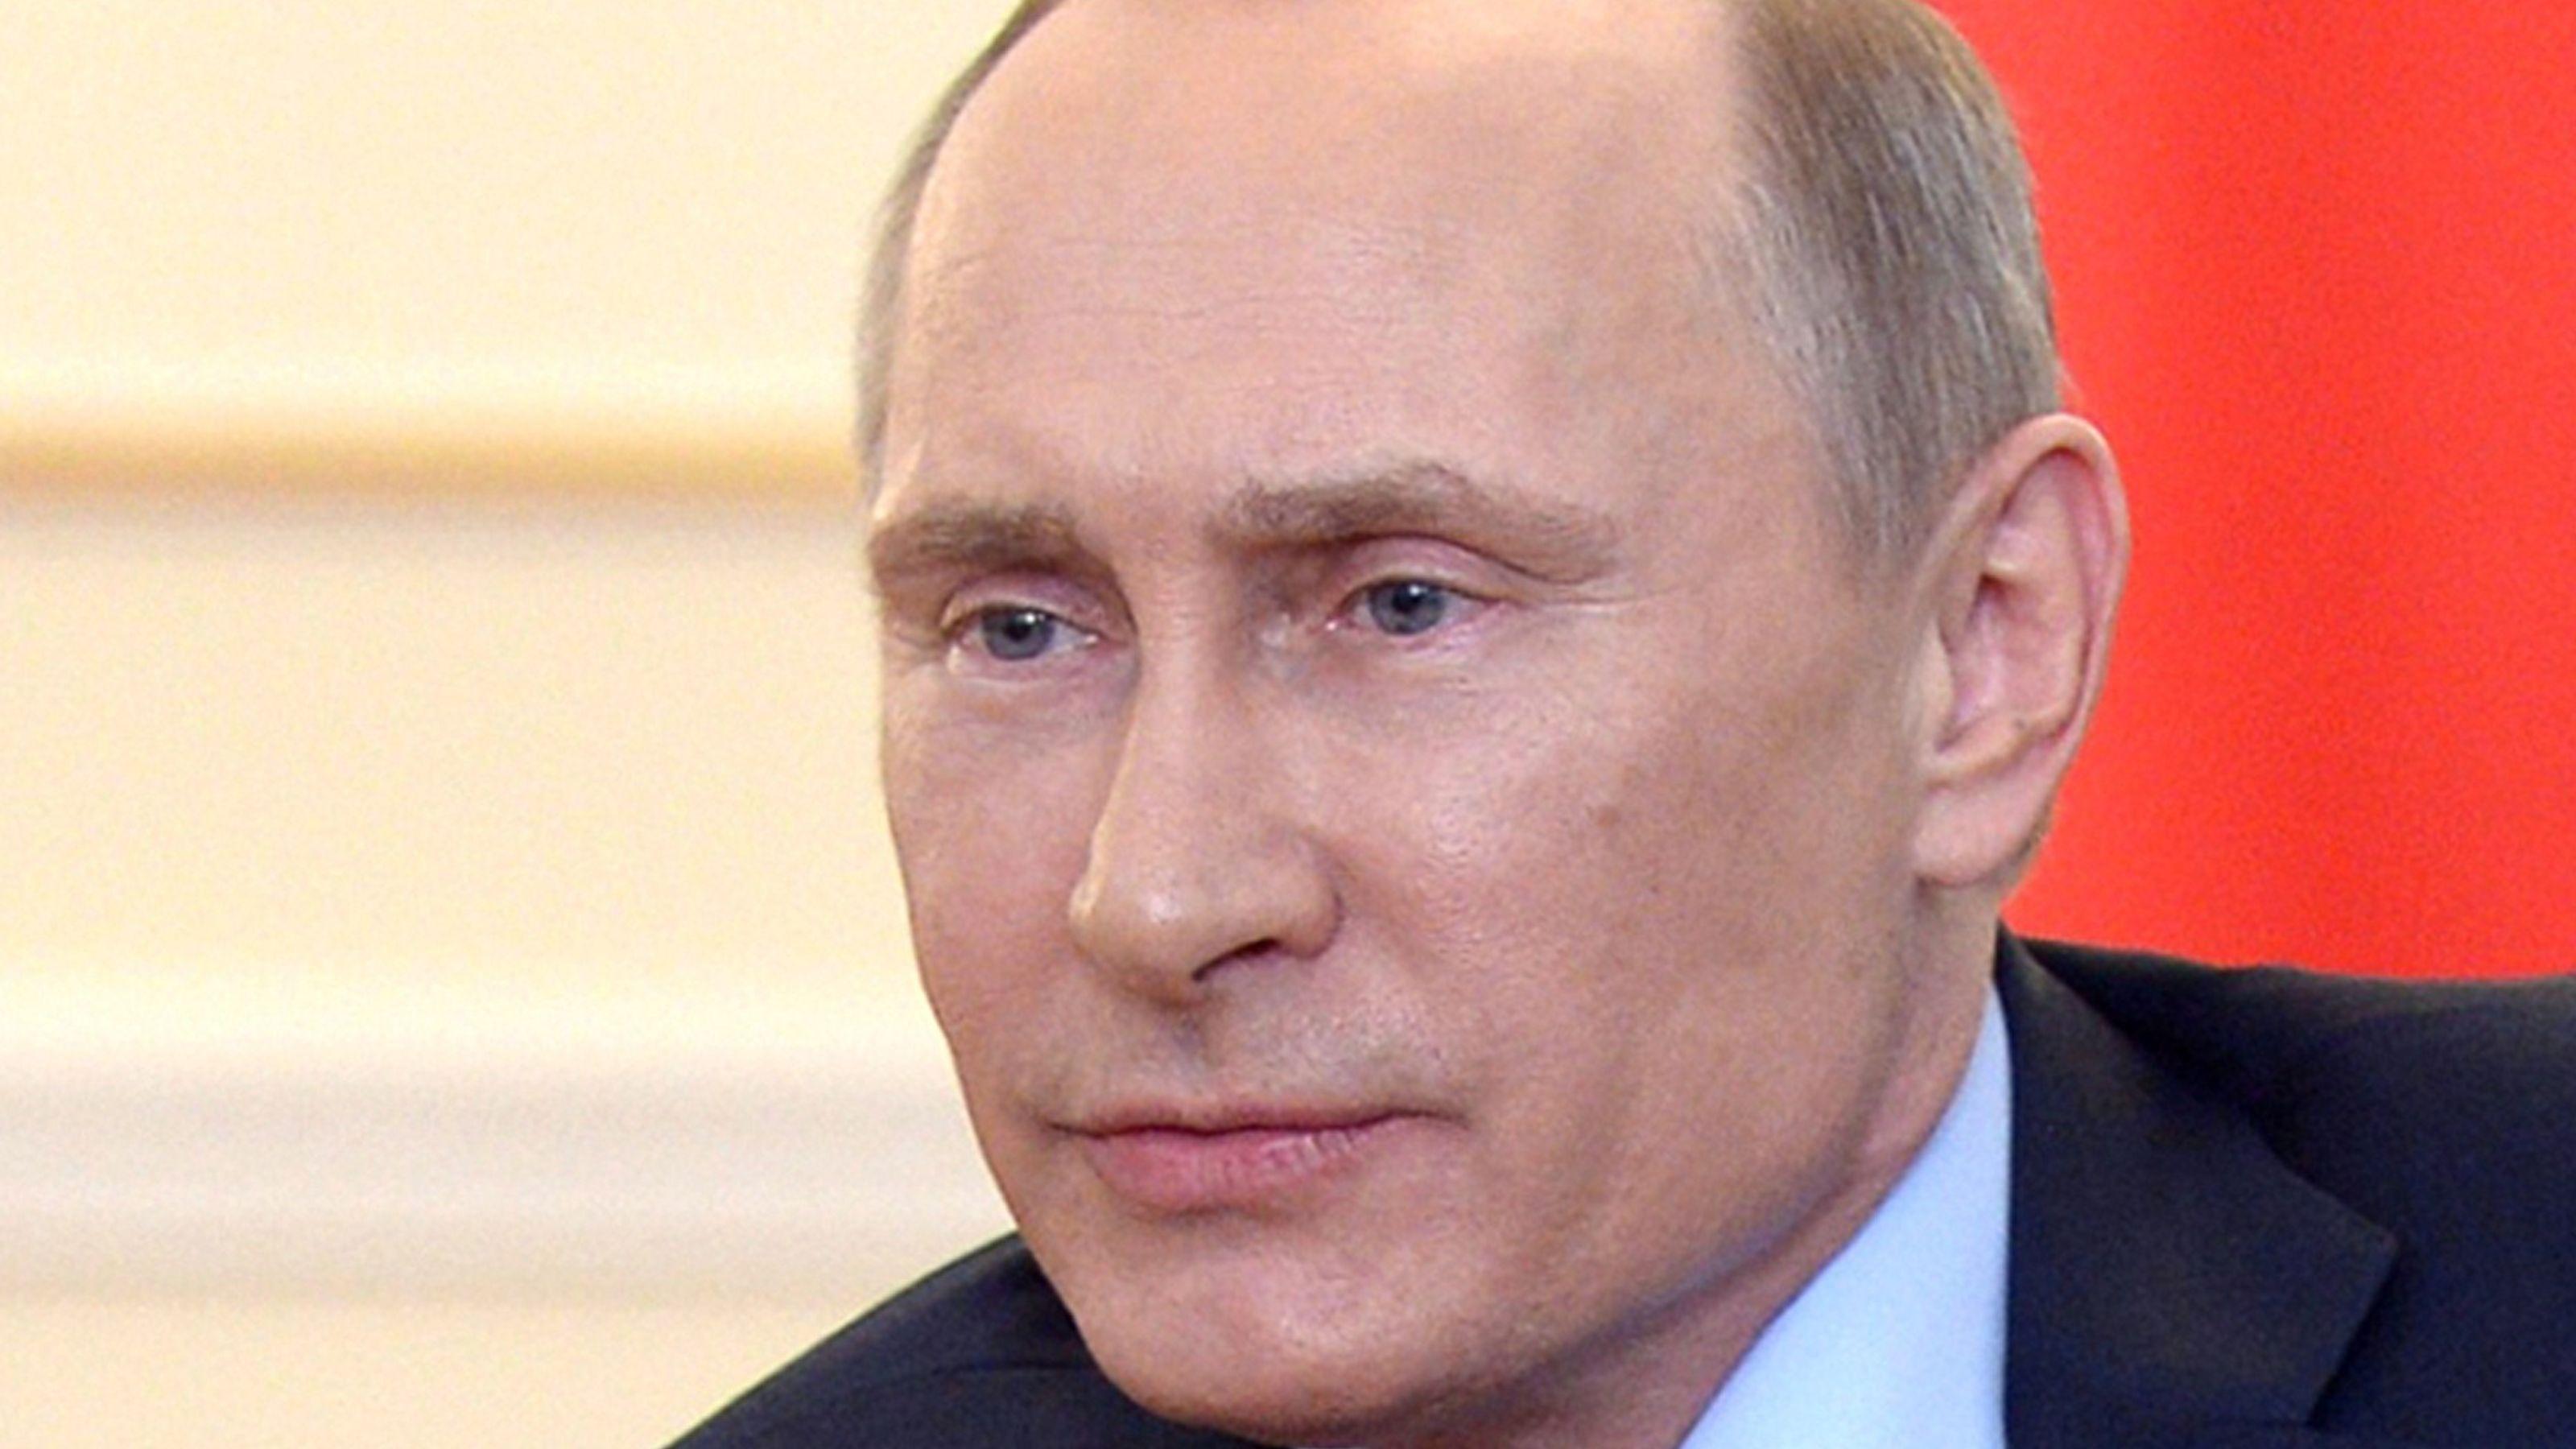 Pentagon 2008 study claims Putin has Asperger s syndrome